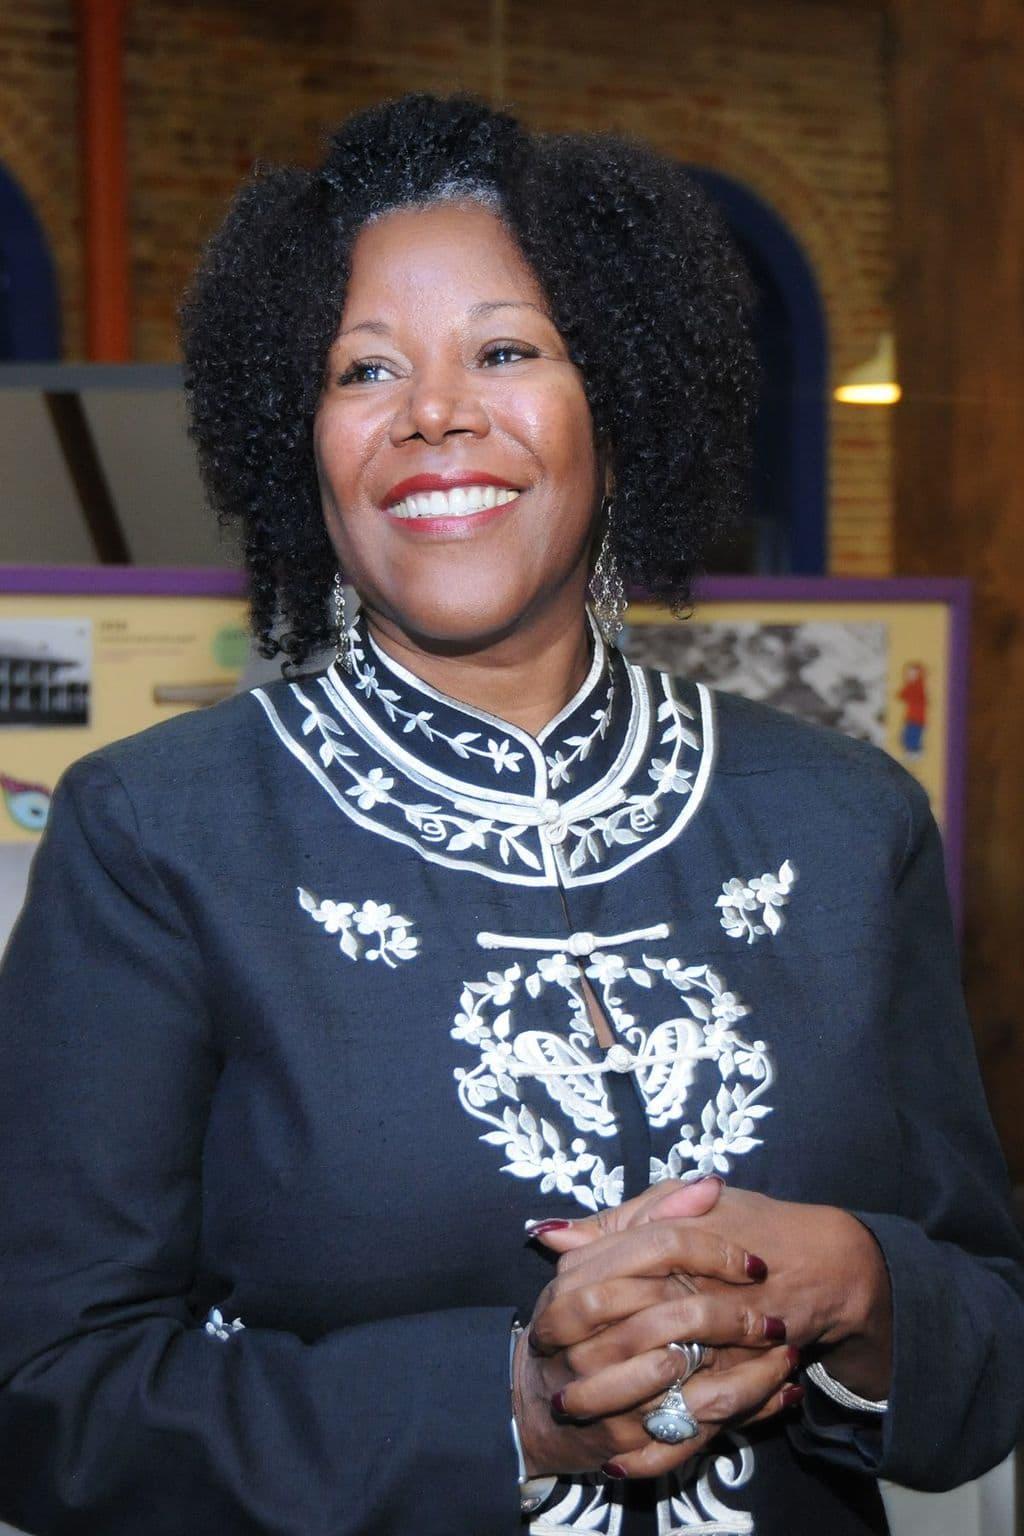 Ruby Bridges The Little Black Girl Who Desegregated New